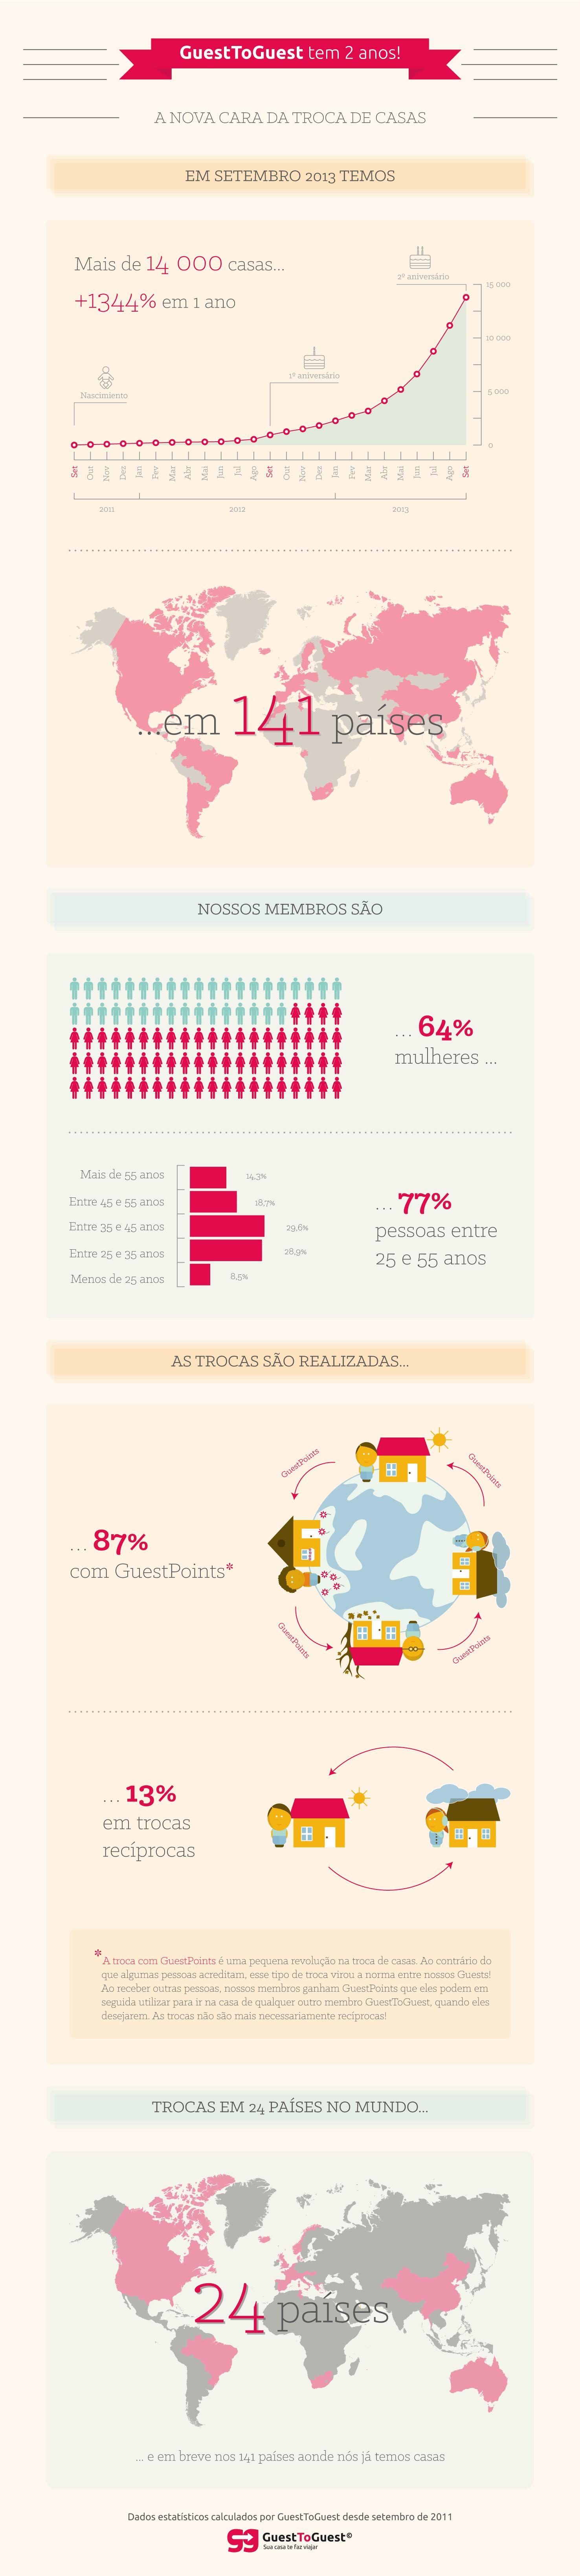 infographie-portuguese